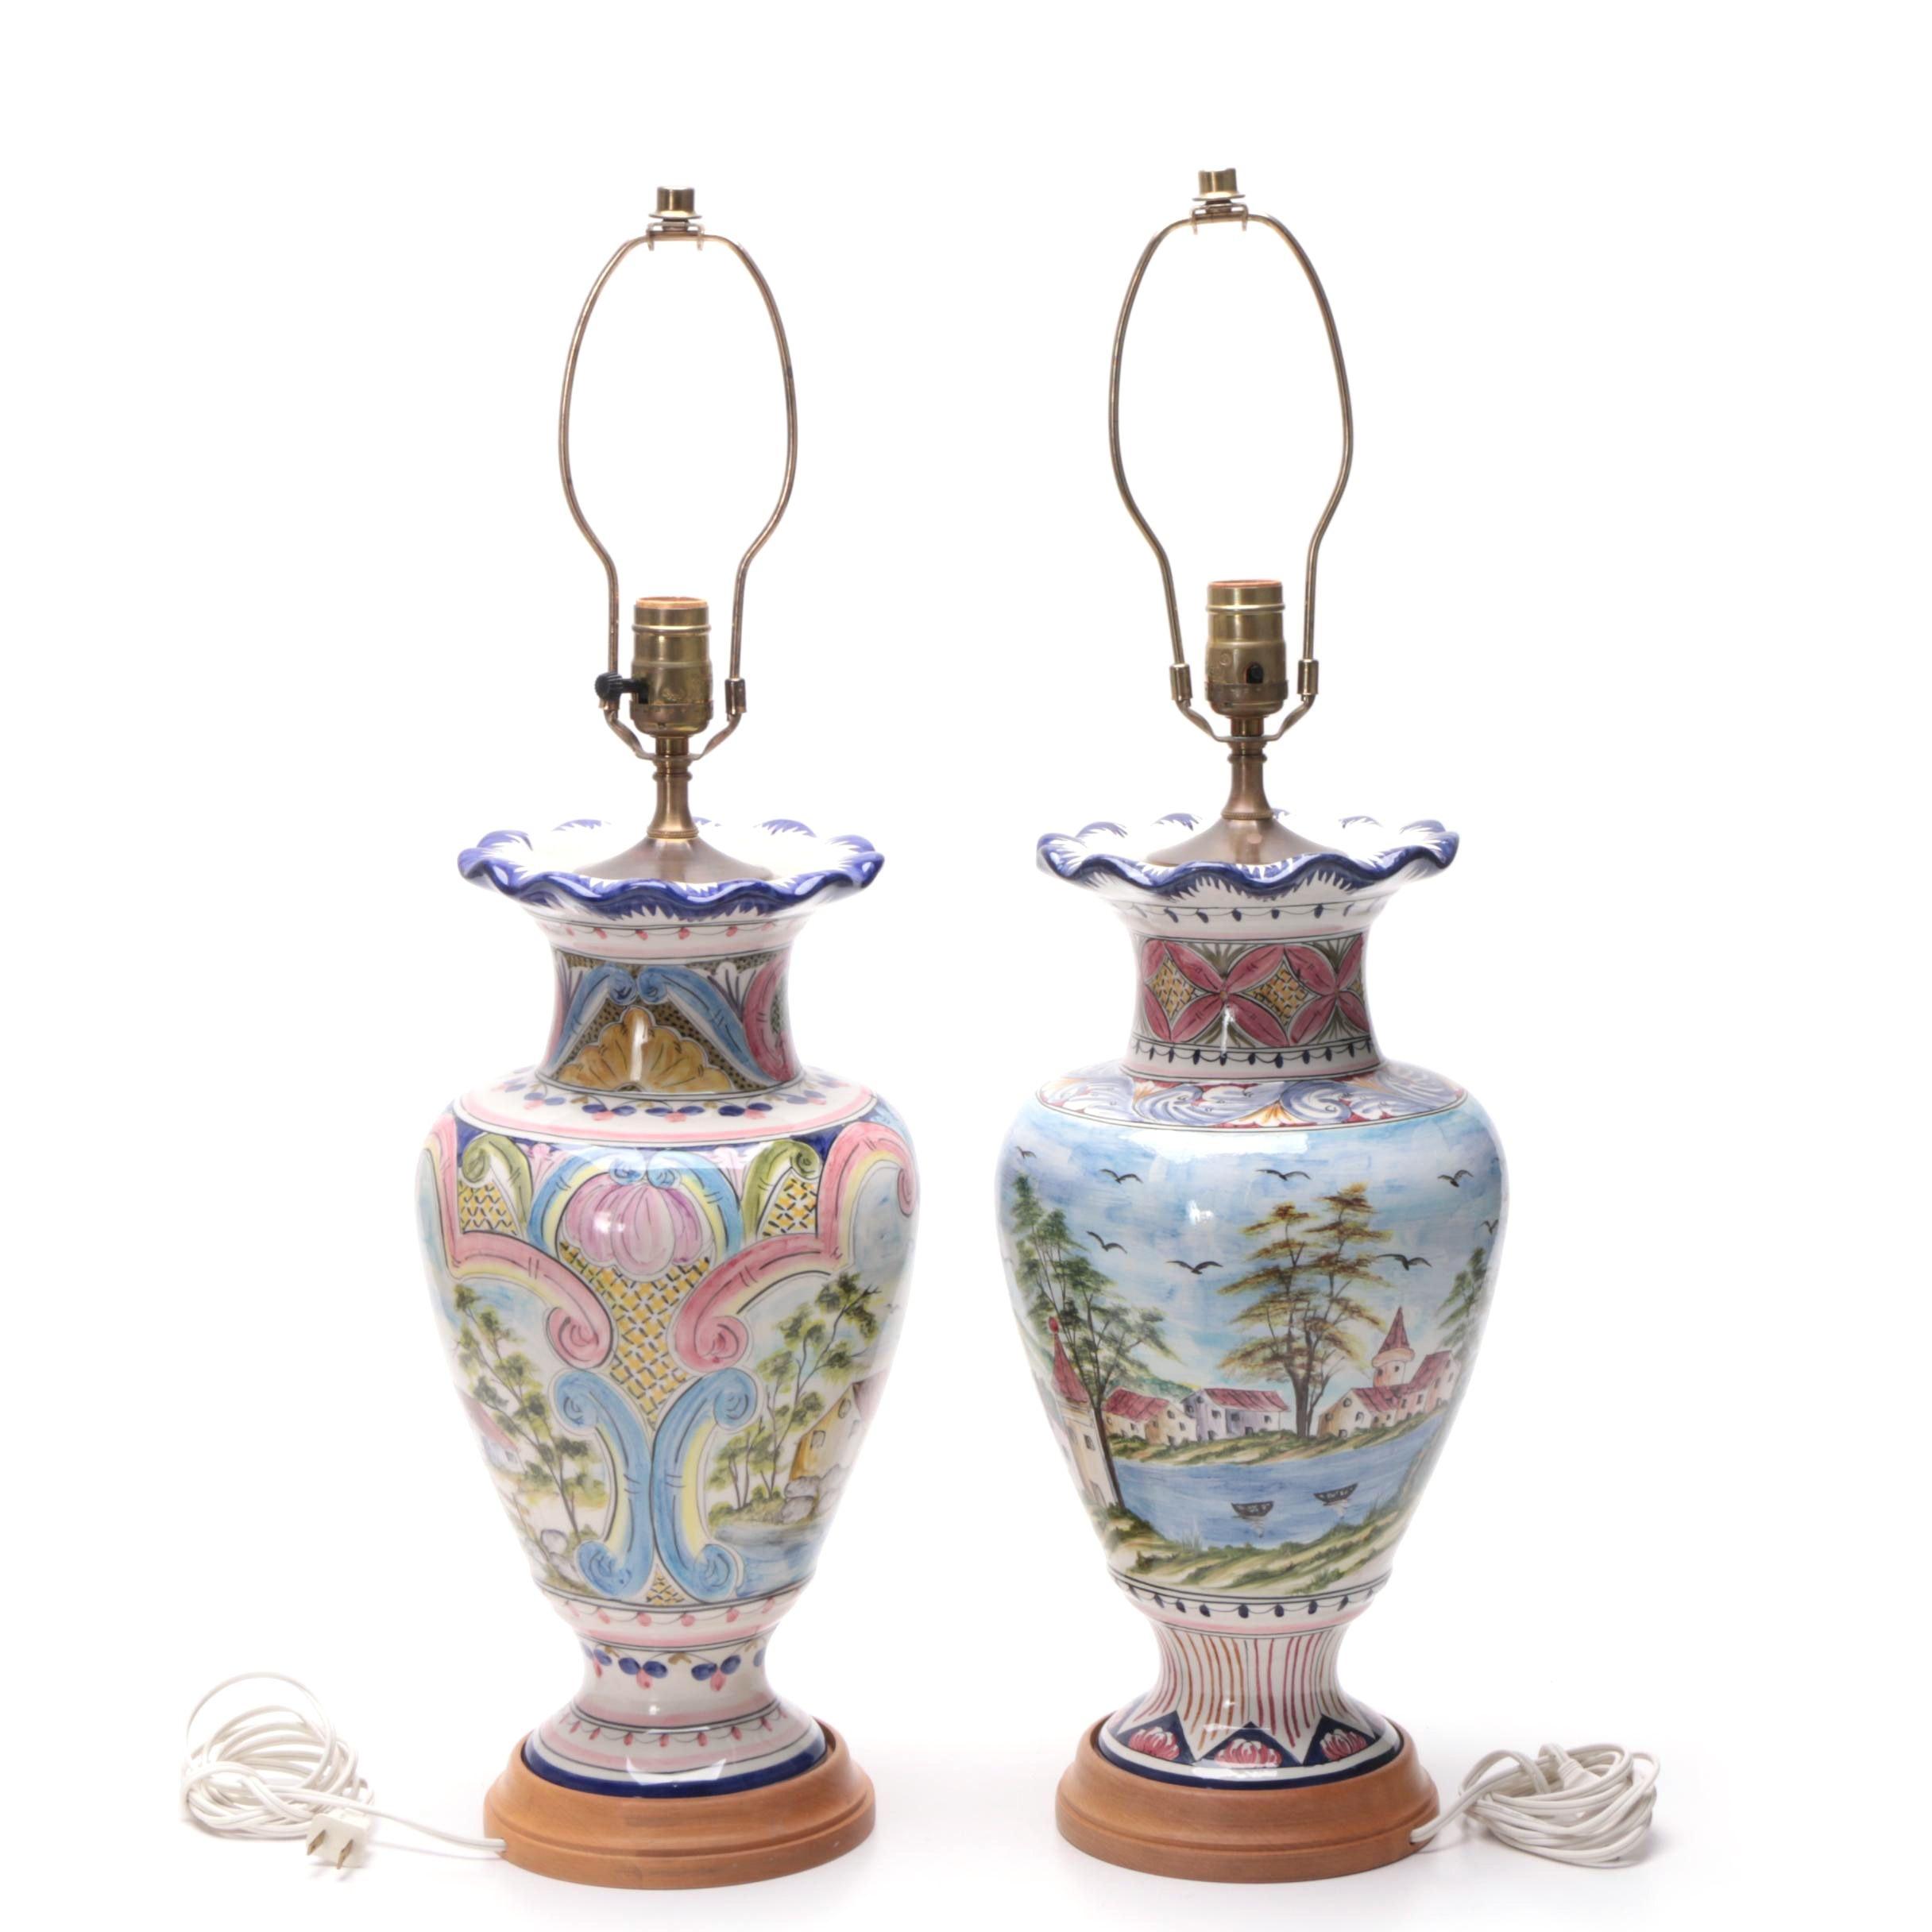 Repurposed Vase Table Lamps featuring Hand-Painted Seaside Scenes